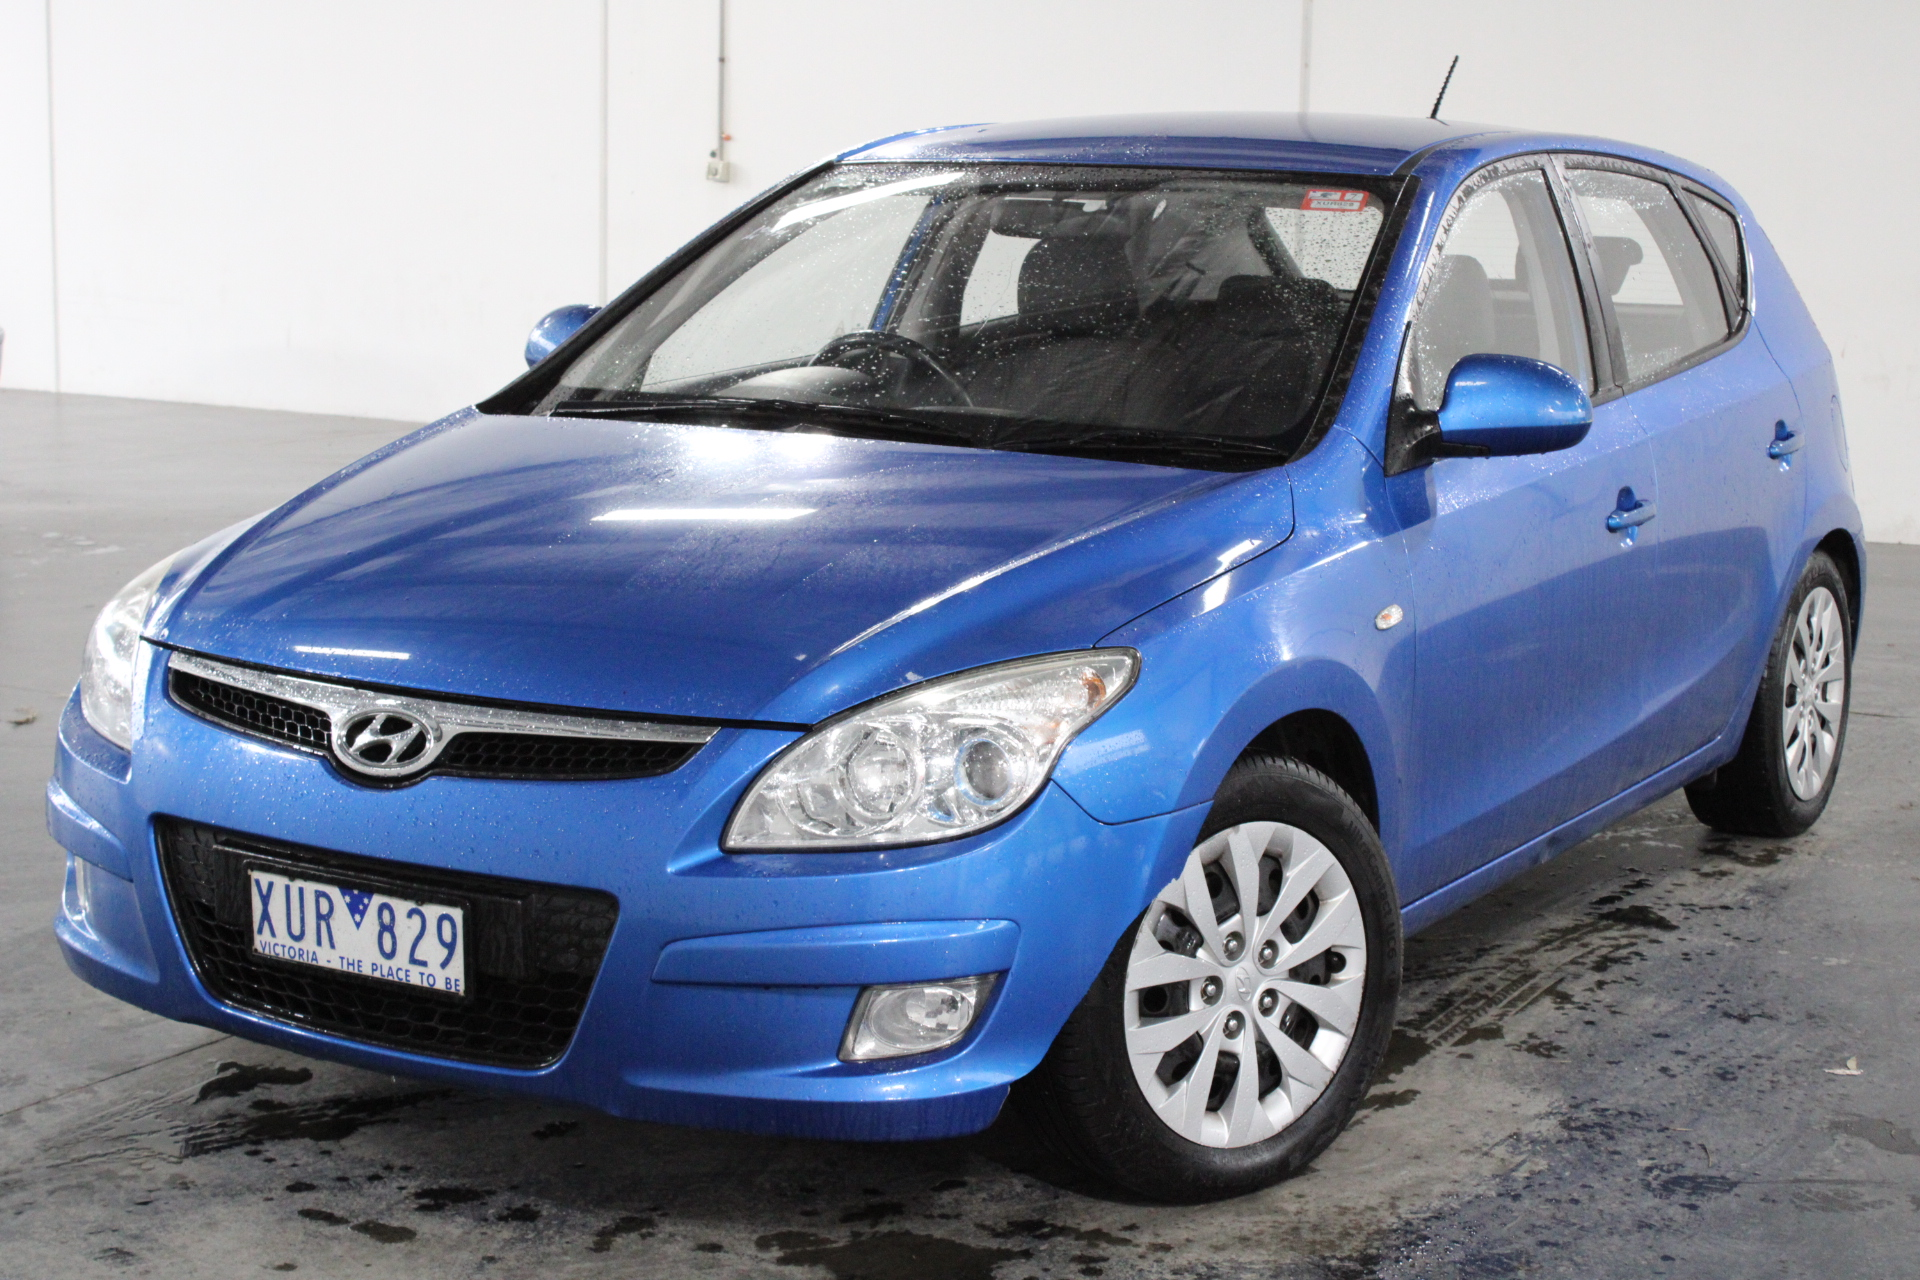 2010 Hyundai i30 SLX FD Automatic Hatchback